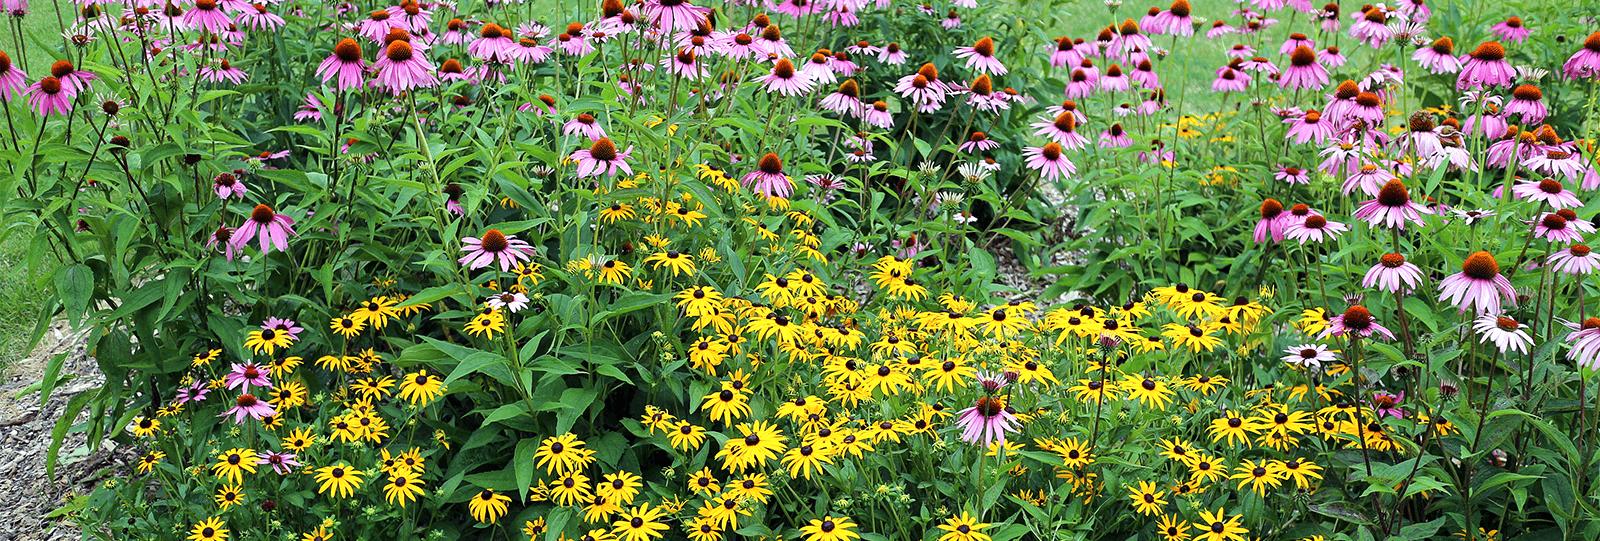 plants for all seasons drought tolerant native plants coneflowers